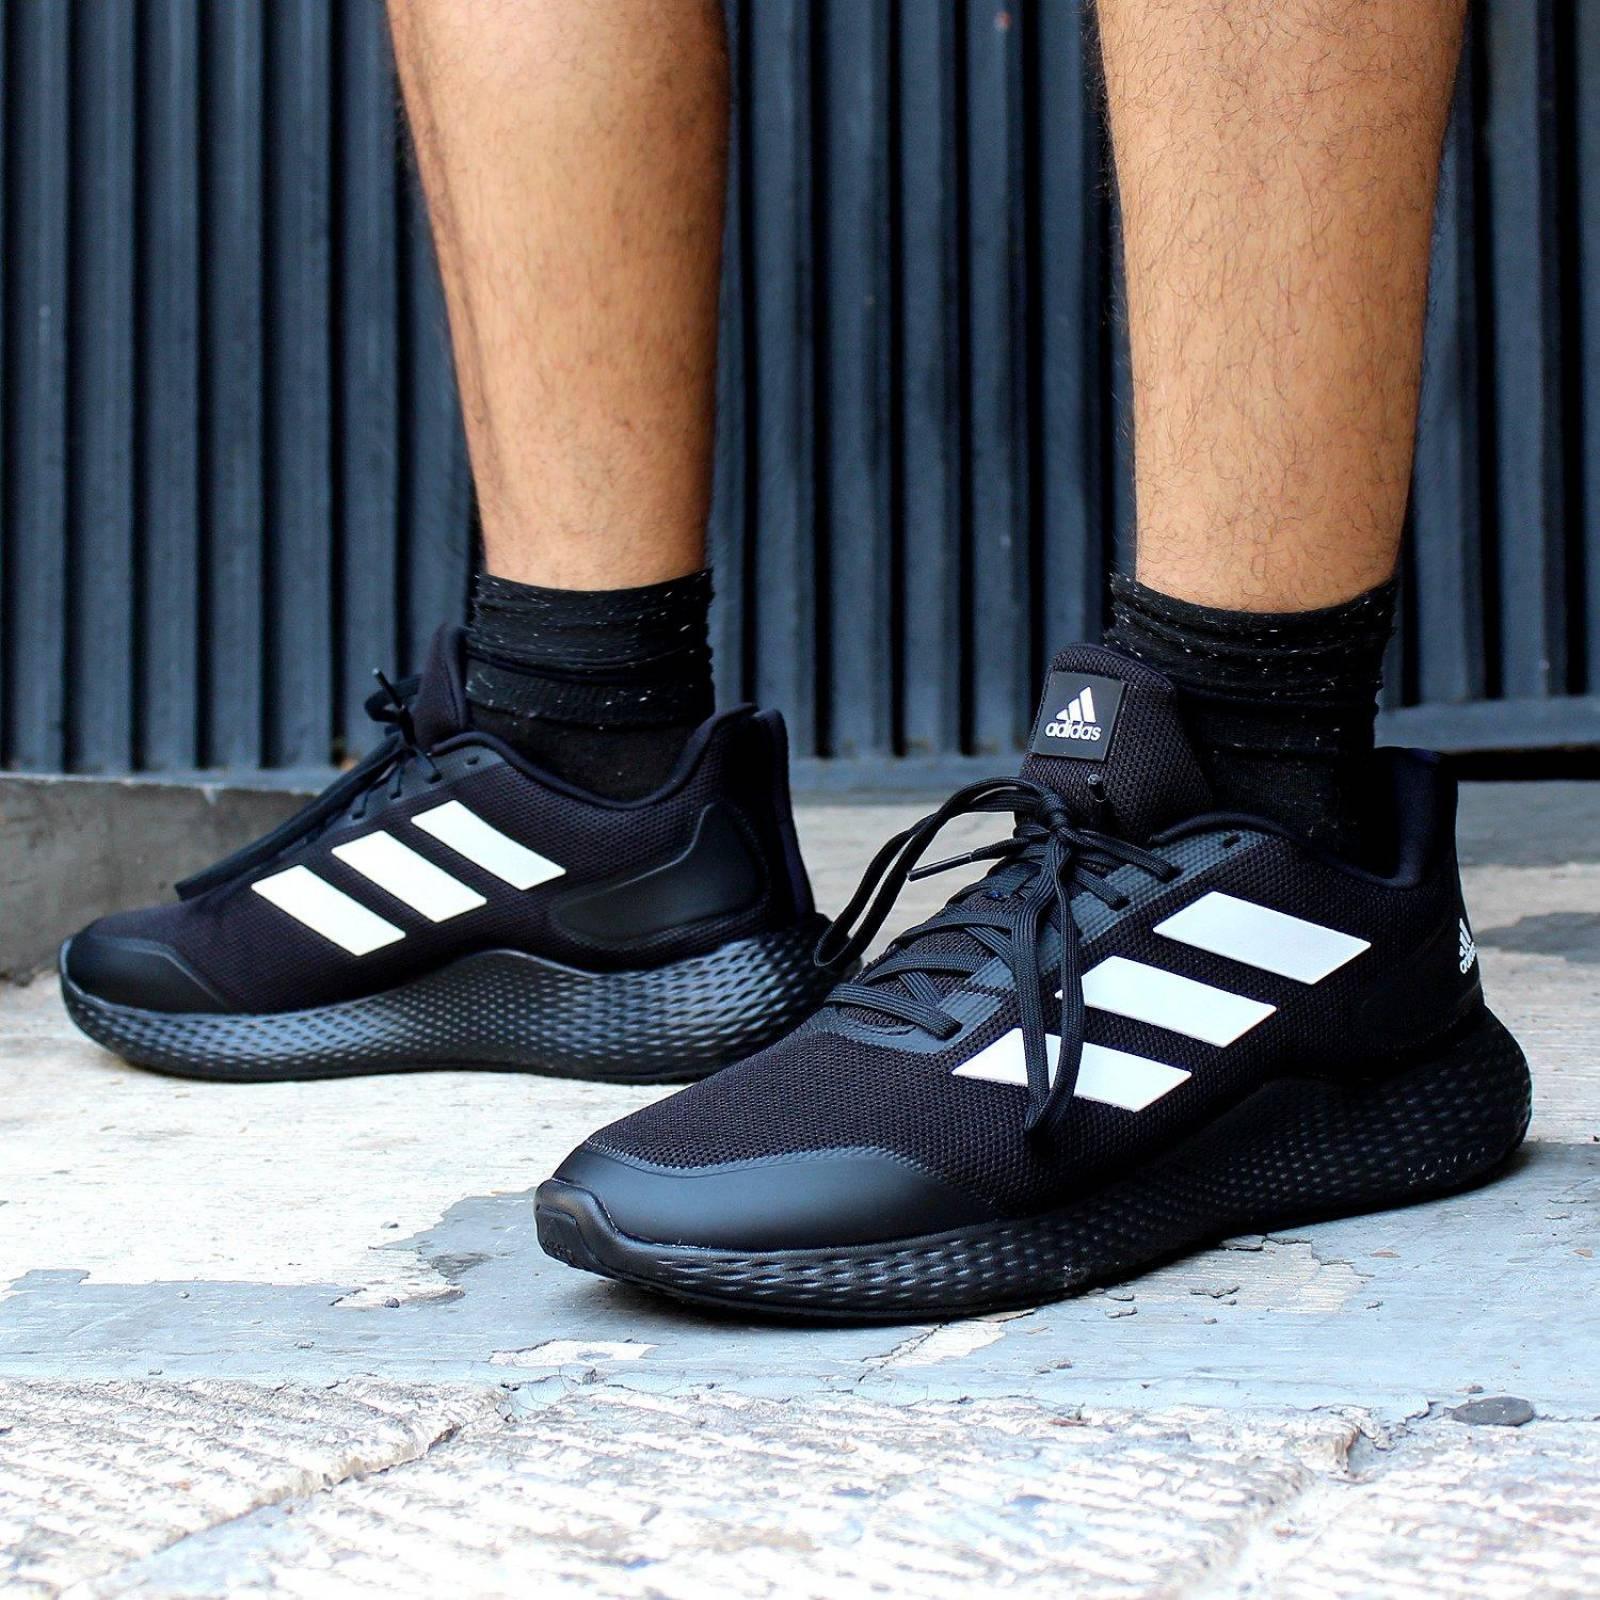 Tenis Adidas Edge Gameday - EE4169 - Negro - Hombre